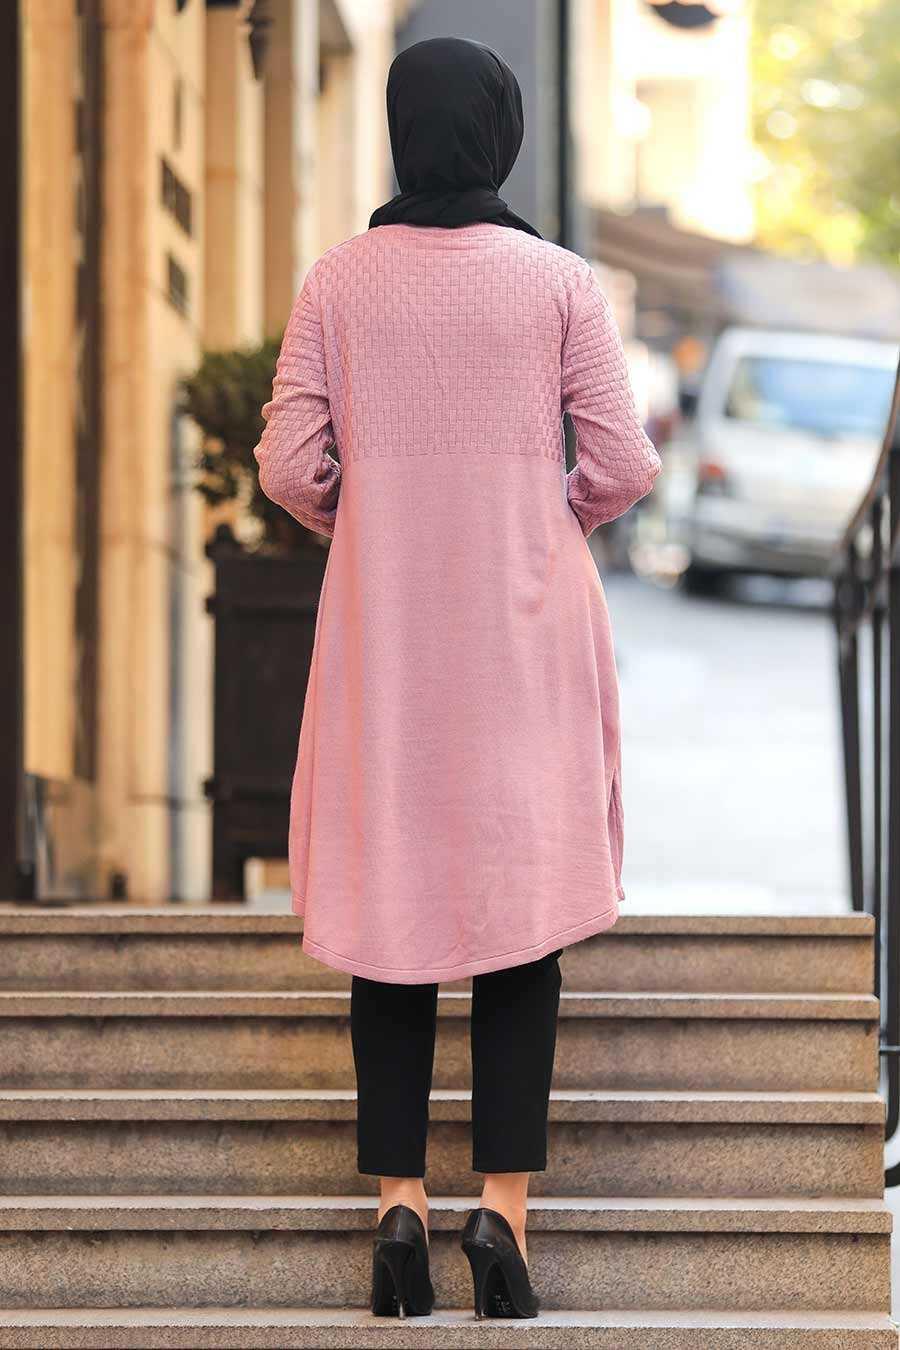 Dusty Rose Hijab Knitwear Tunic 1964GK